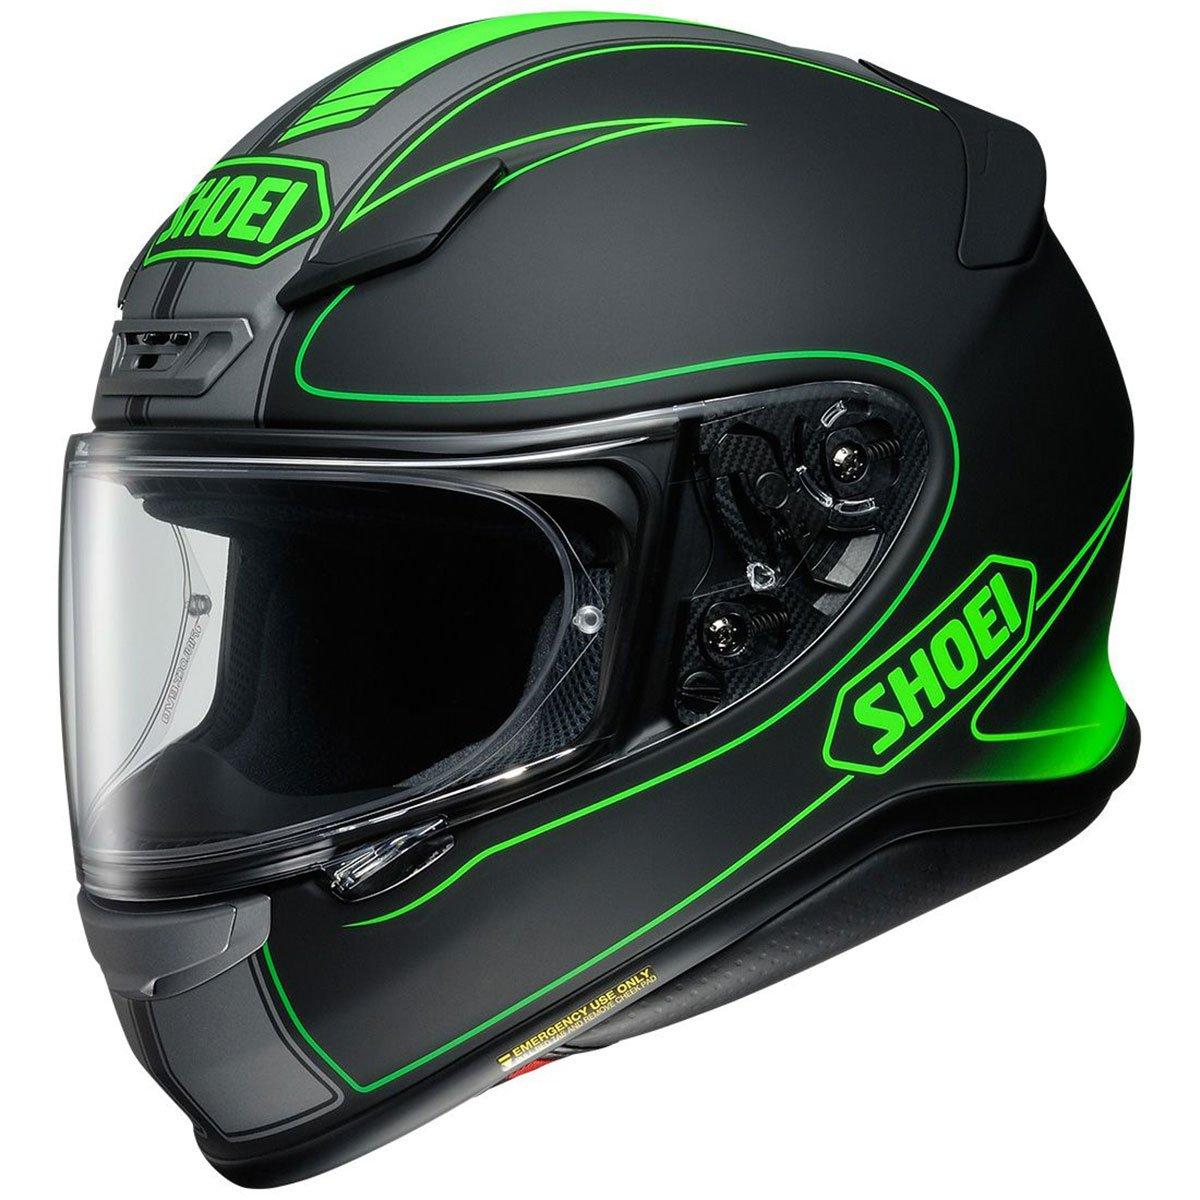 Shoei RF-1200 Flagger Sports Bike Racing Motorcycle Helmet - TC-4 / Small